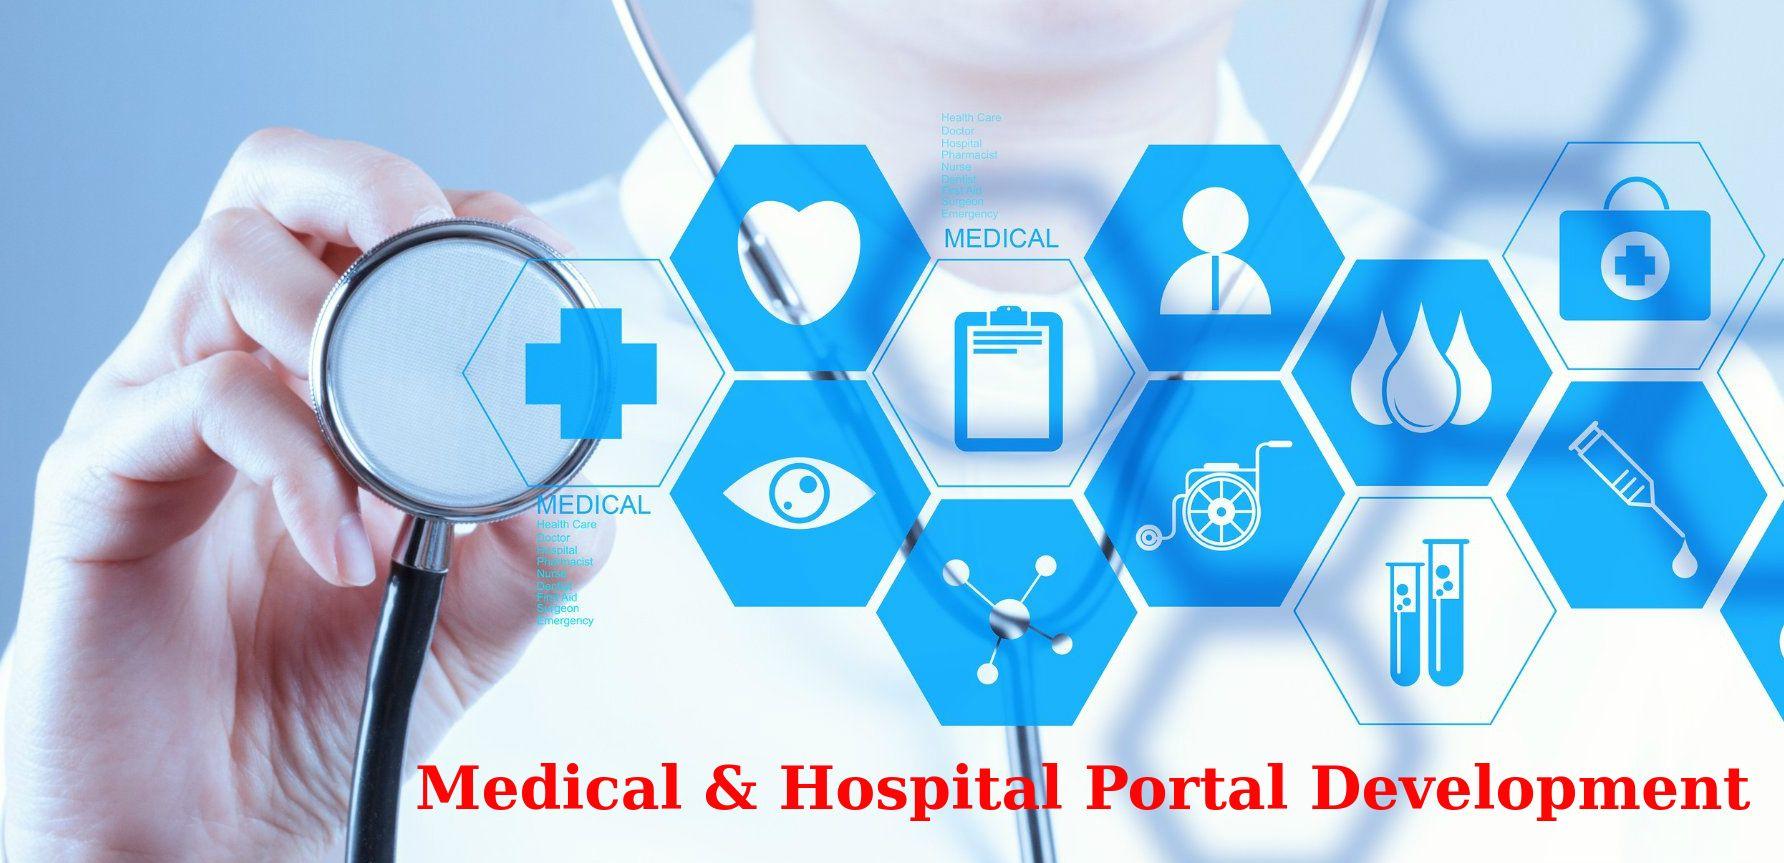 Nettechnocrats It Services Is Leading Medical Health Portal